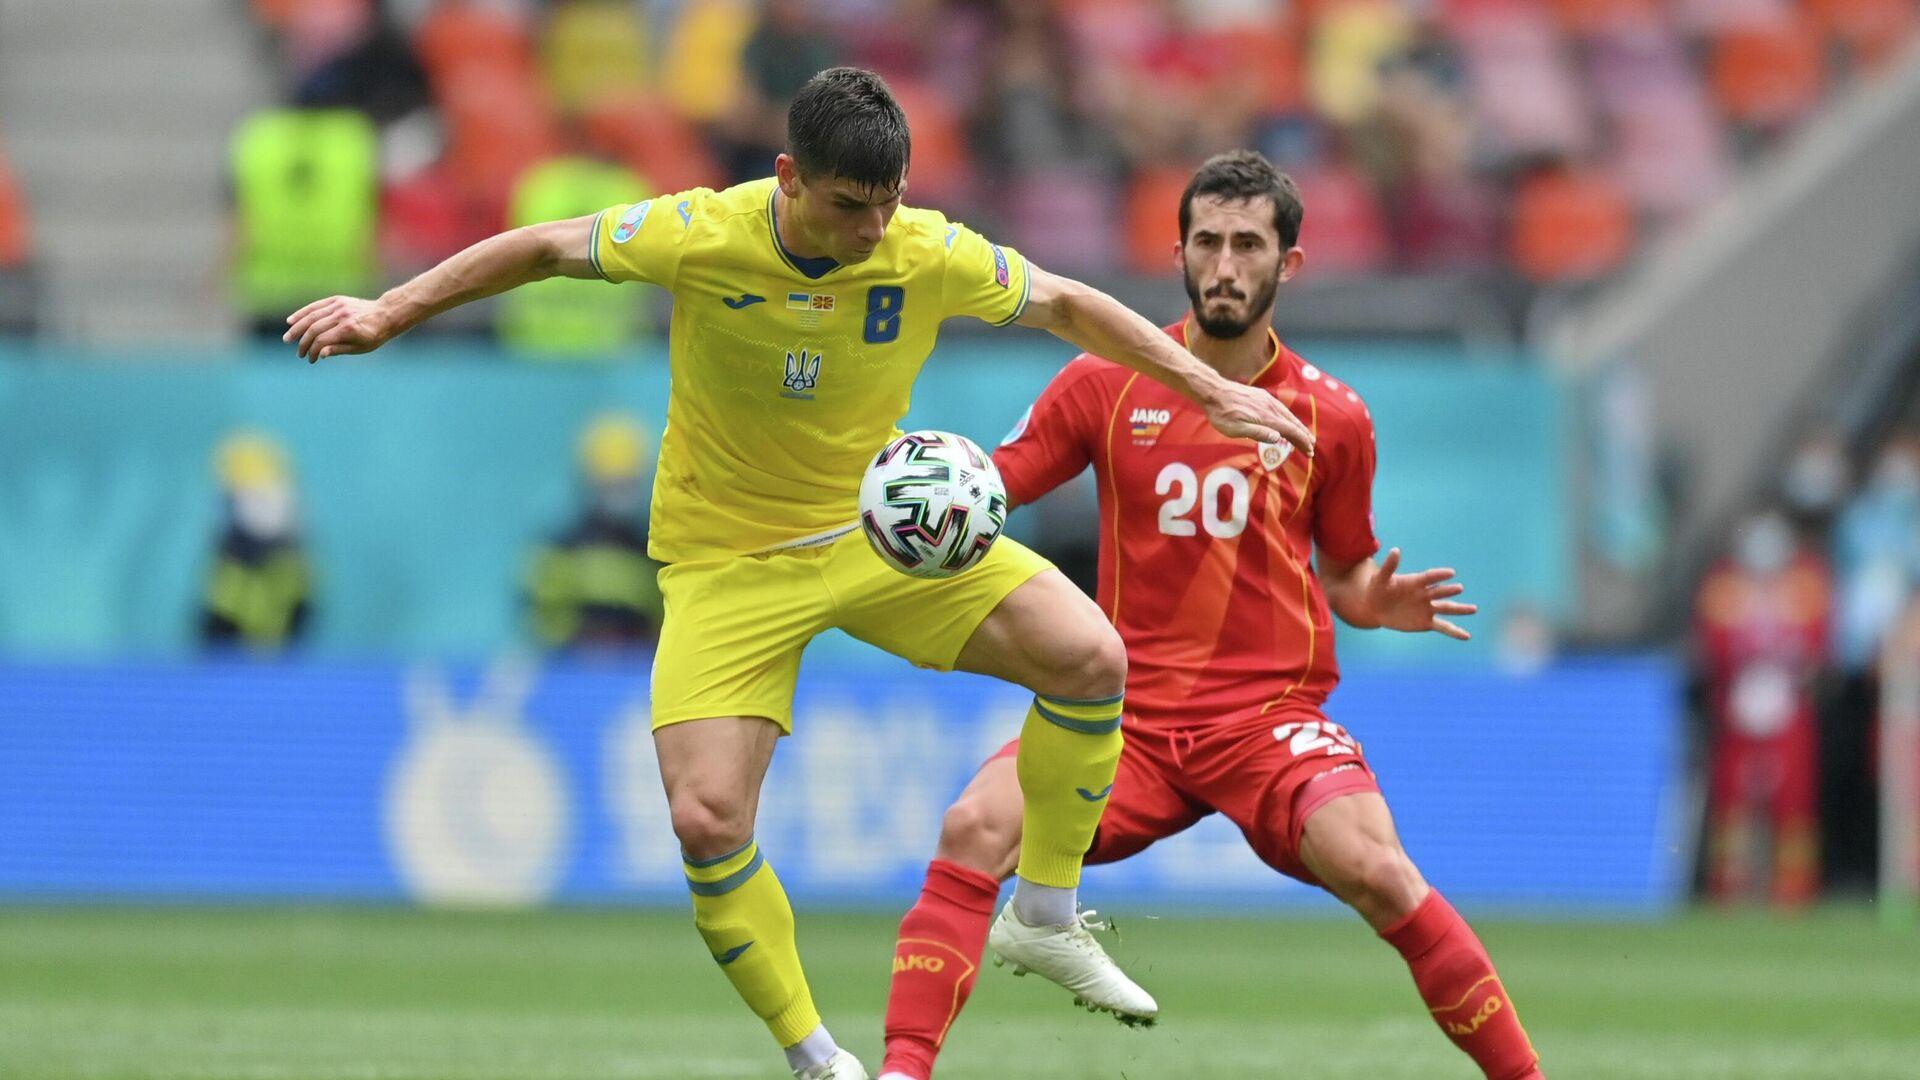 Эпизод матча Украина - Северная Македония на ЕВРО-2020 - РИА Новости, 1920, 17.06.2021